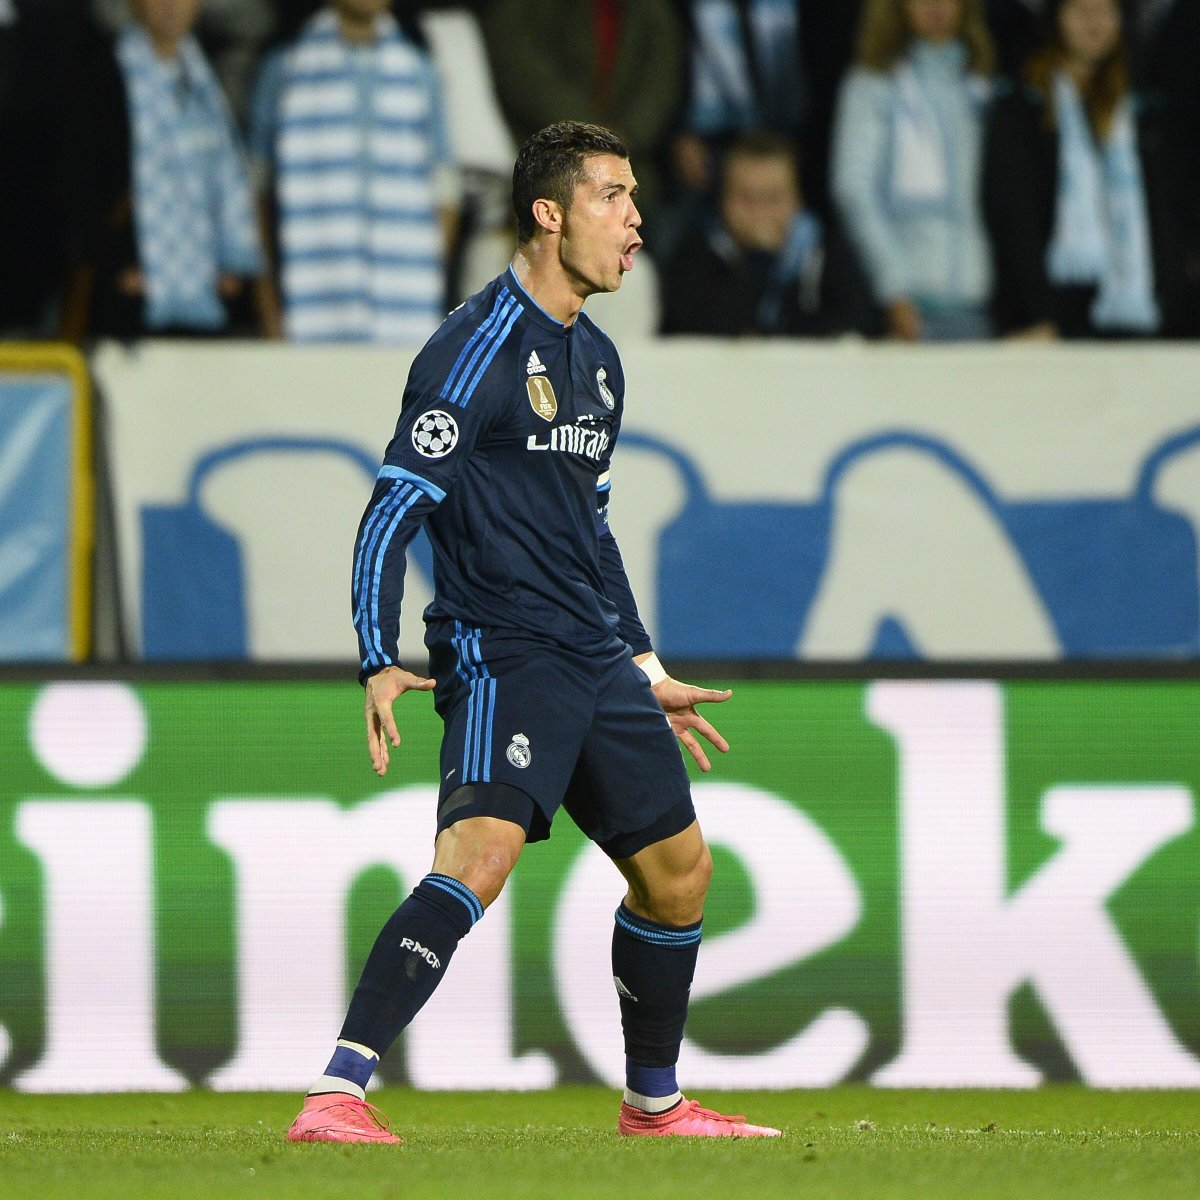 Raúl: 323 goals in 741 Real Madrid games.  Ronaldo: 323 goals in 308 Real Madrid games.  #UCL